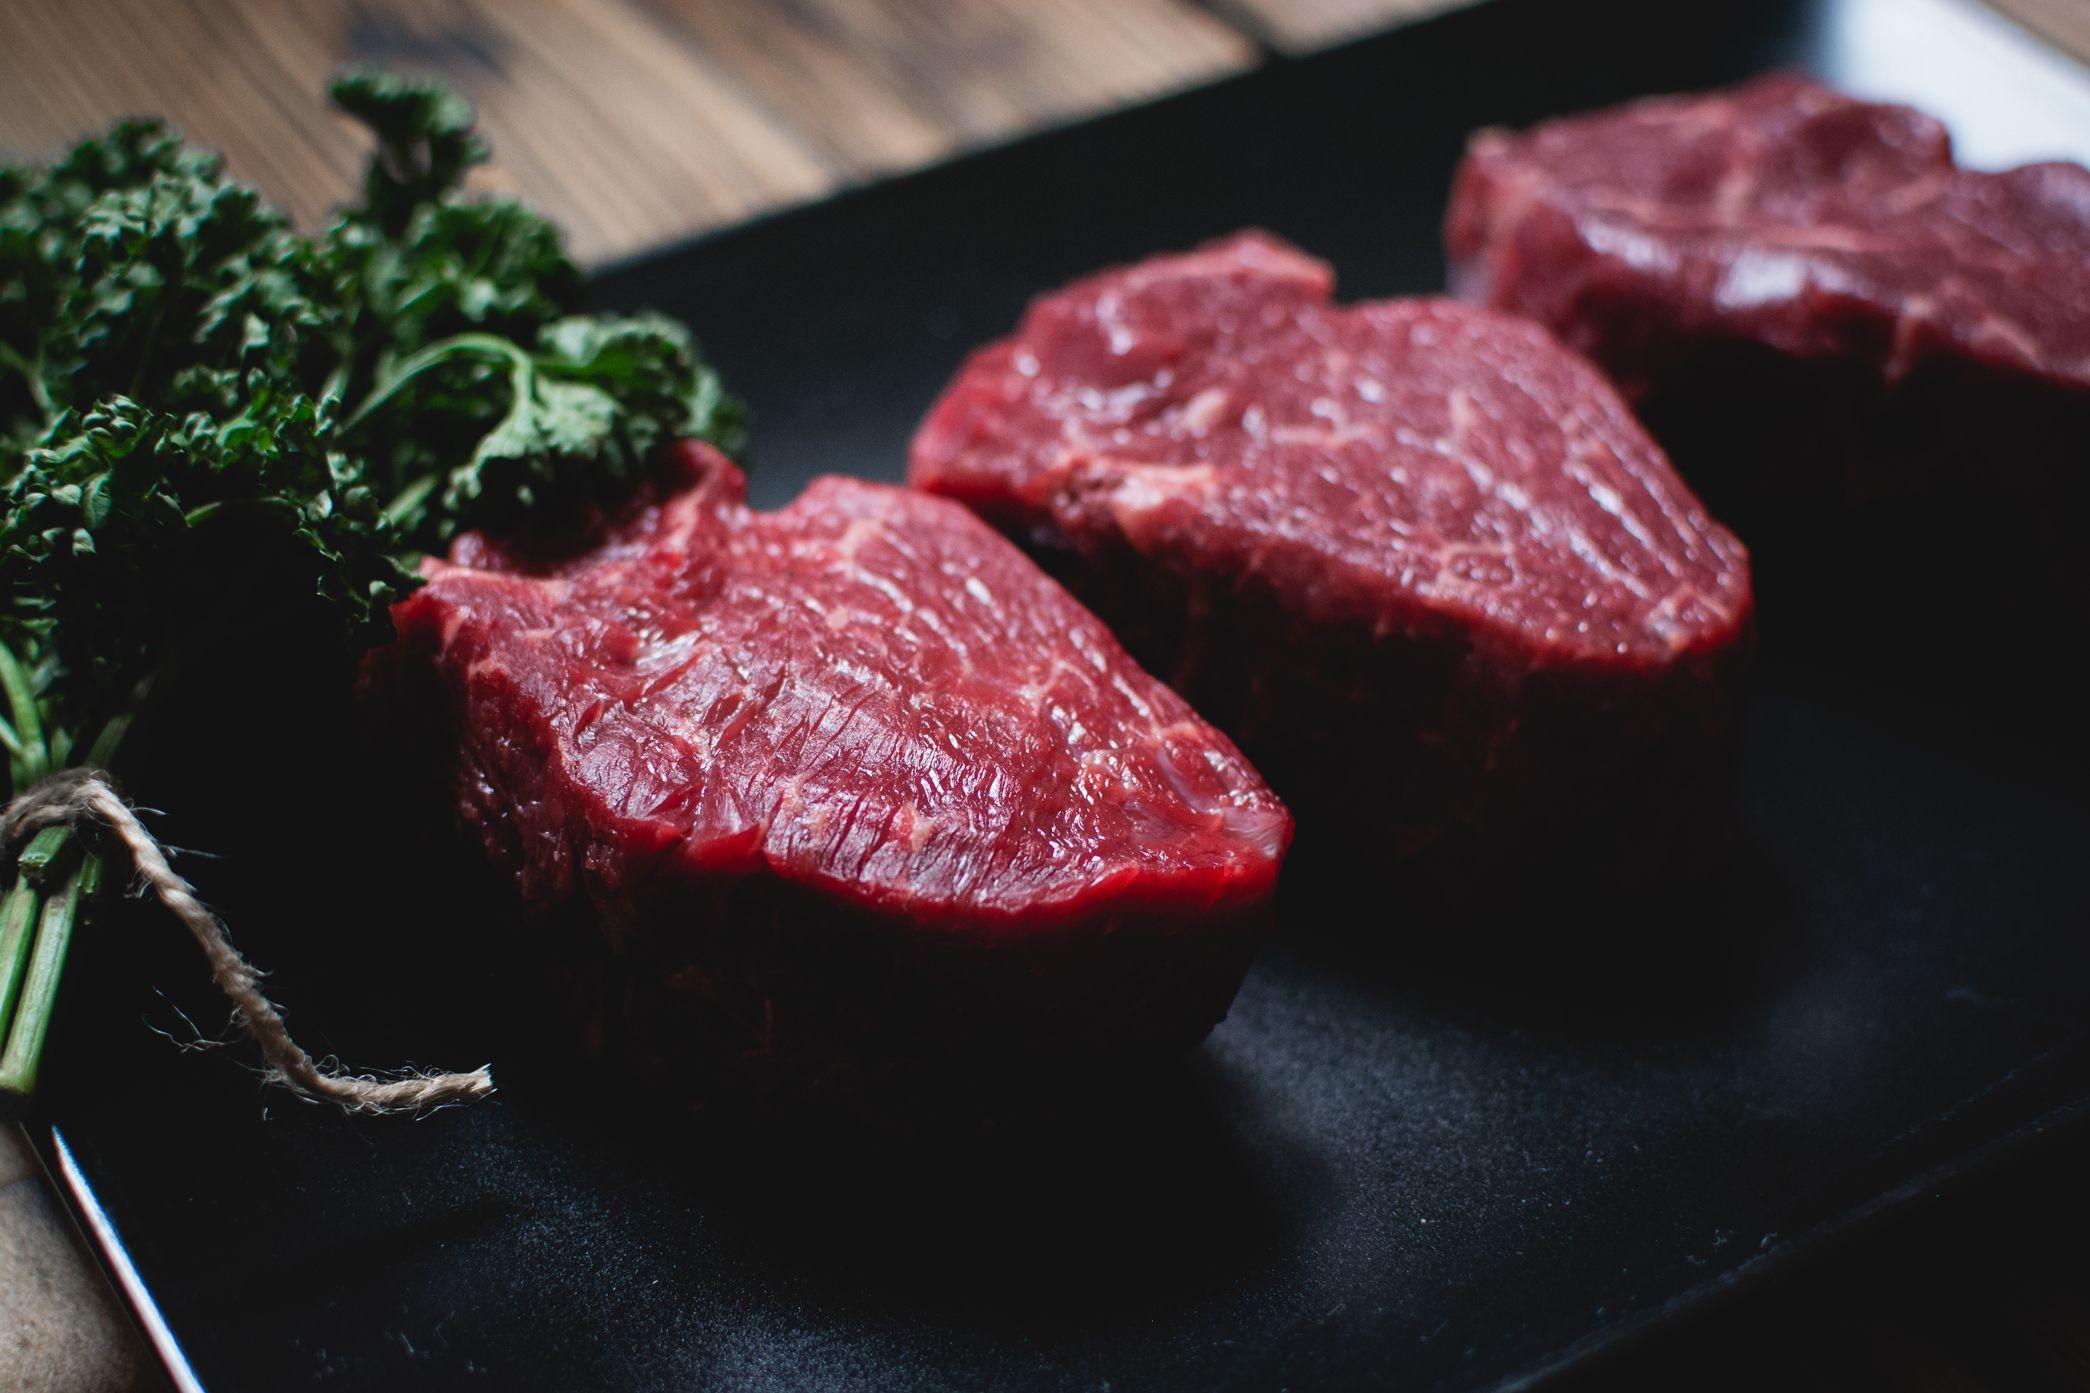 Raw-Beef-Steaks-compressor.jpg